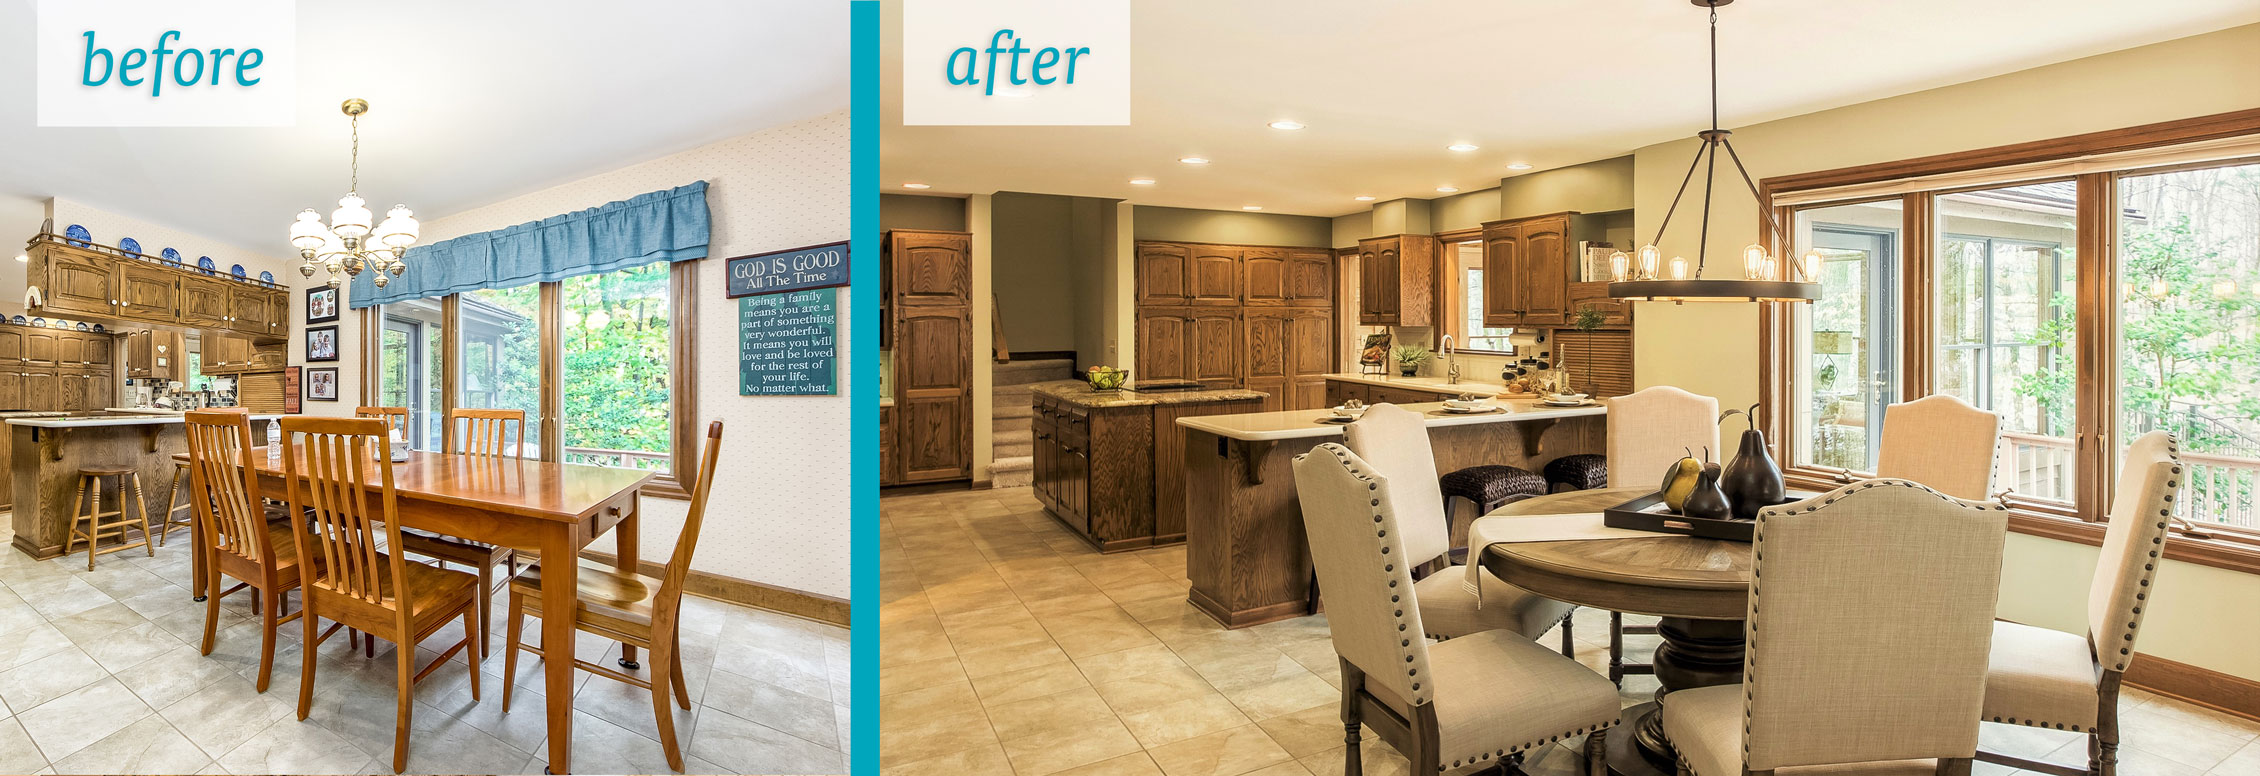 before-after-5-kitchen.jpg